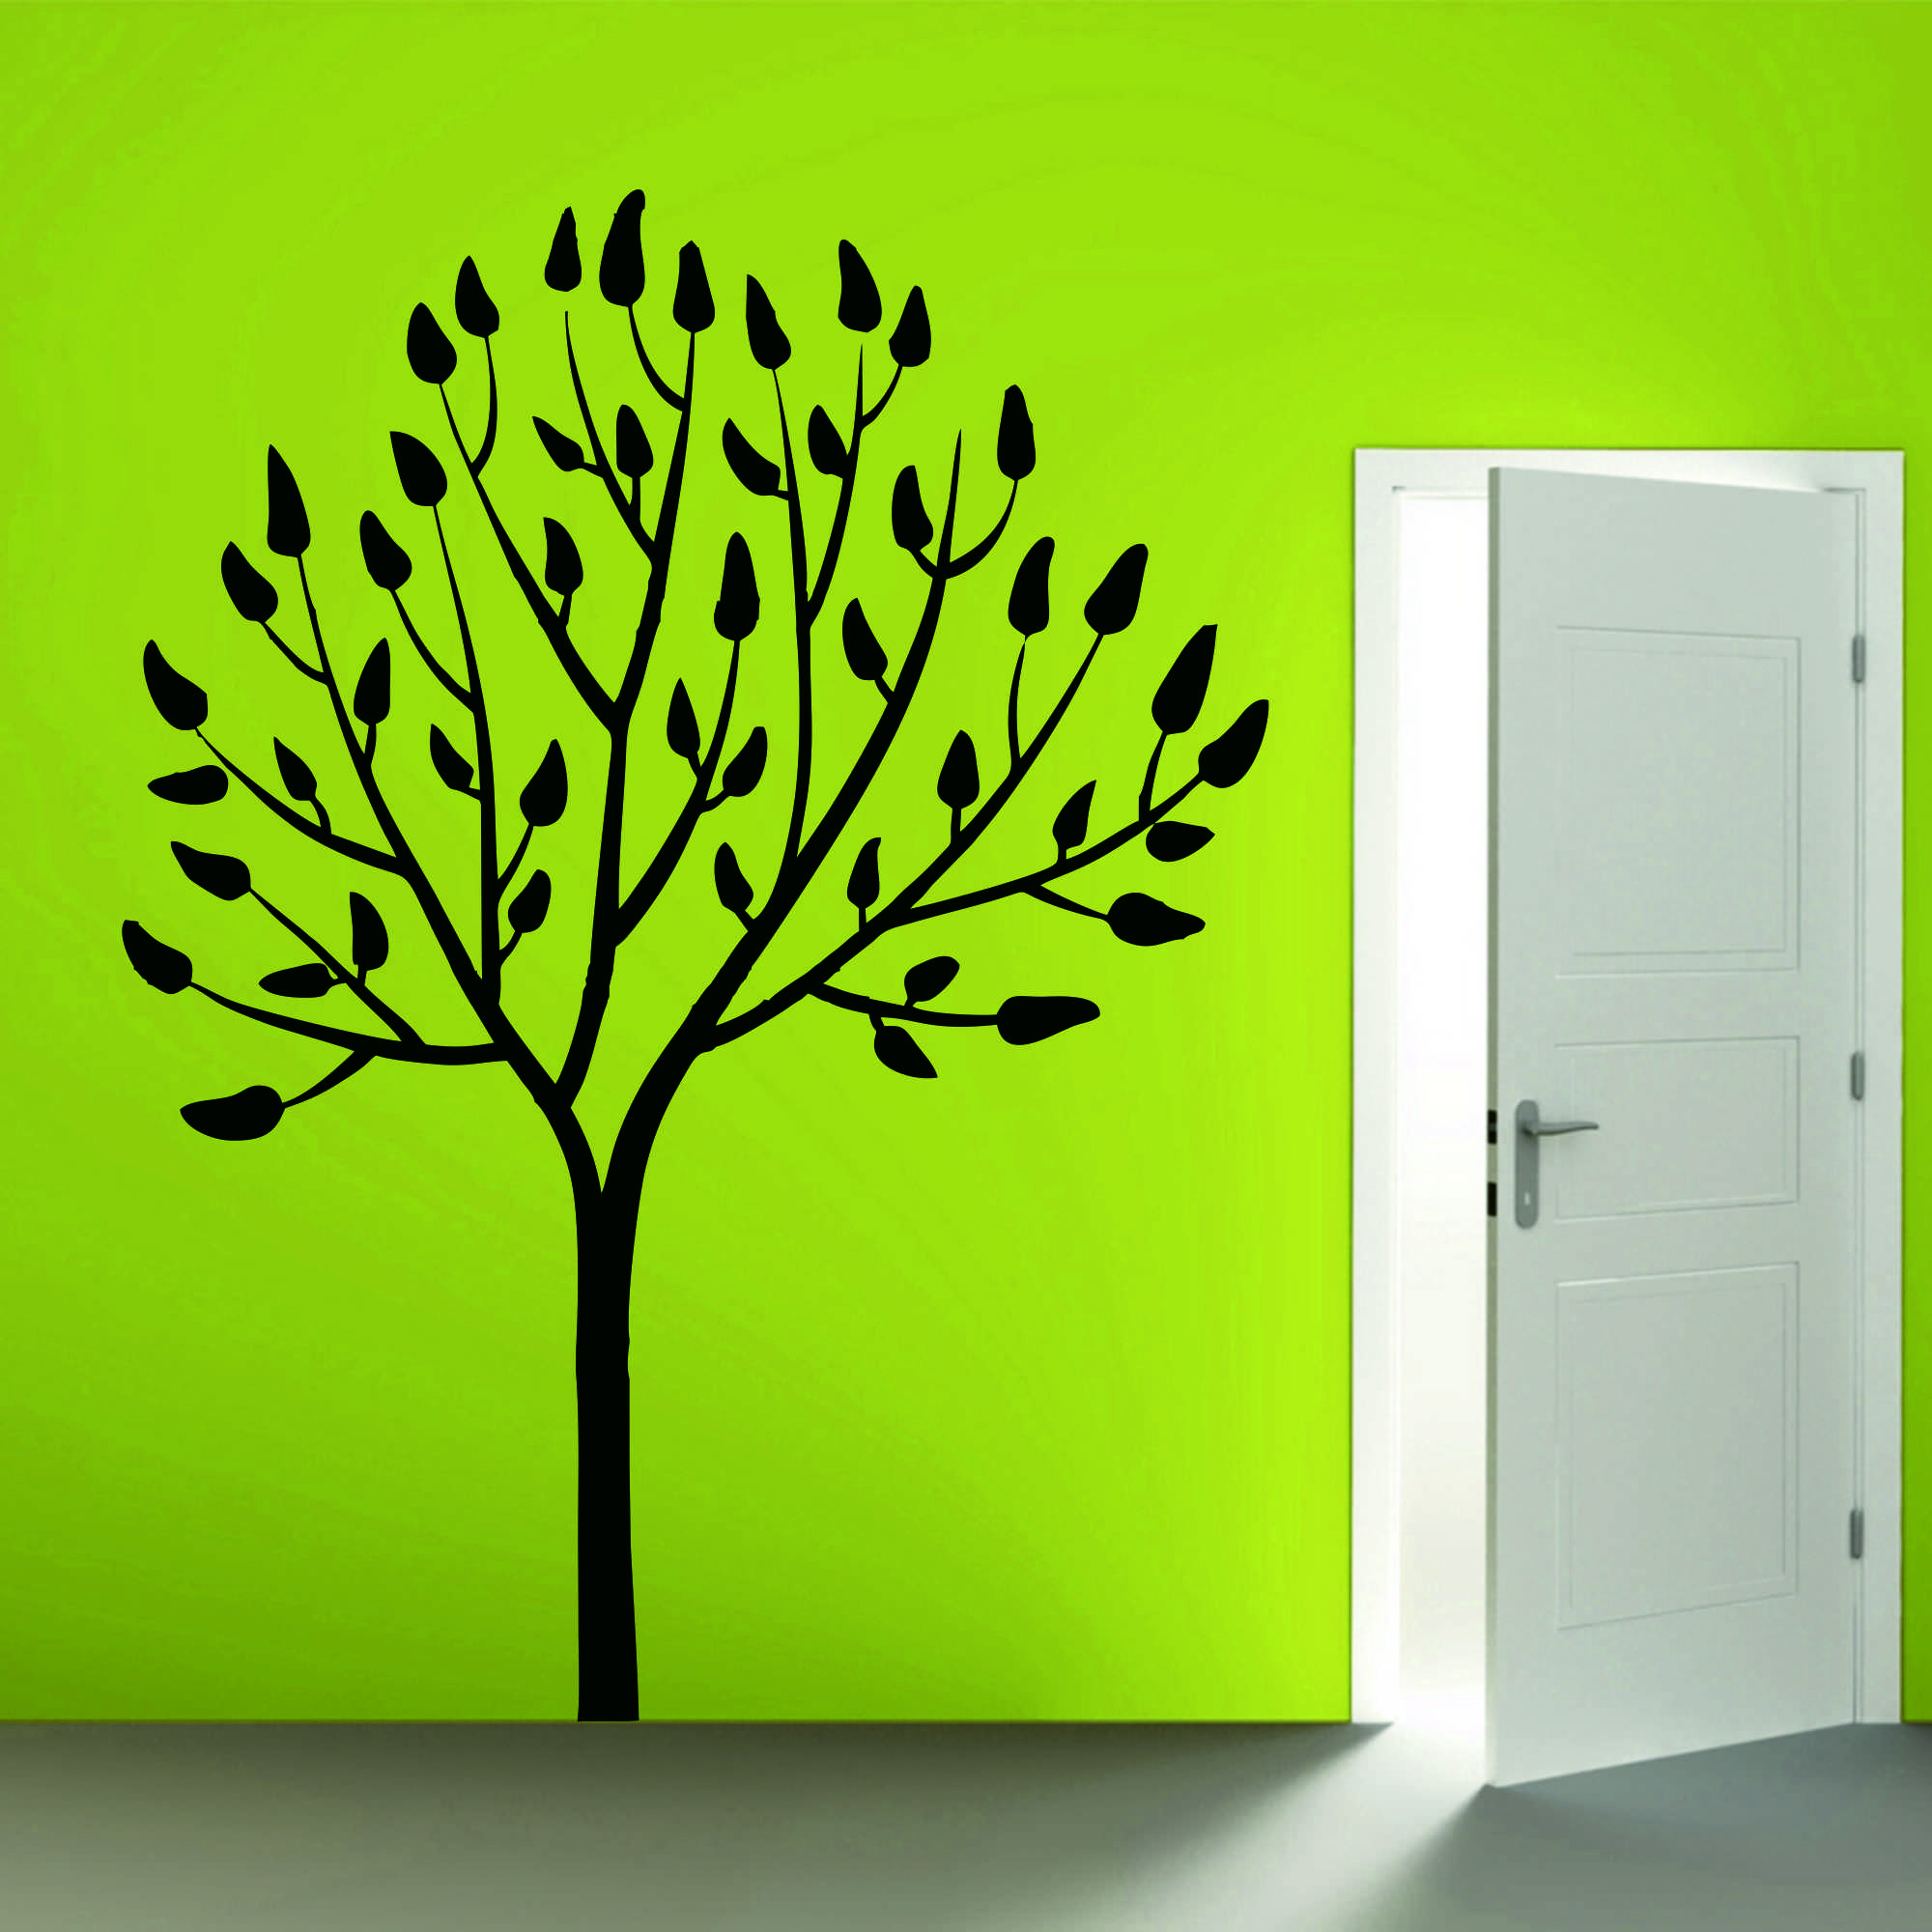 Samolepka na zeď - Strom s listy - 45x60 cm - PopyDesign